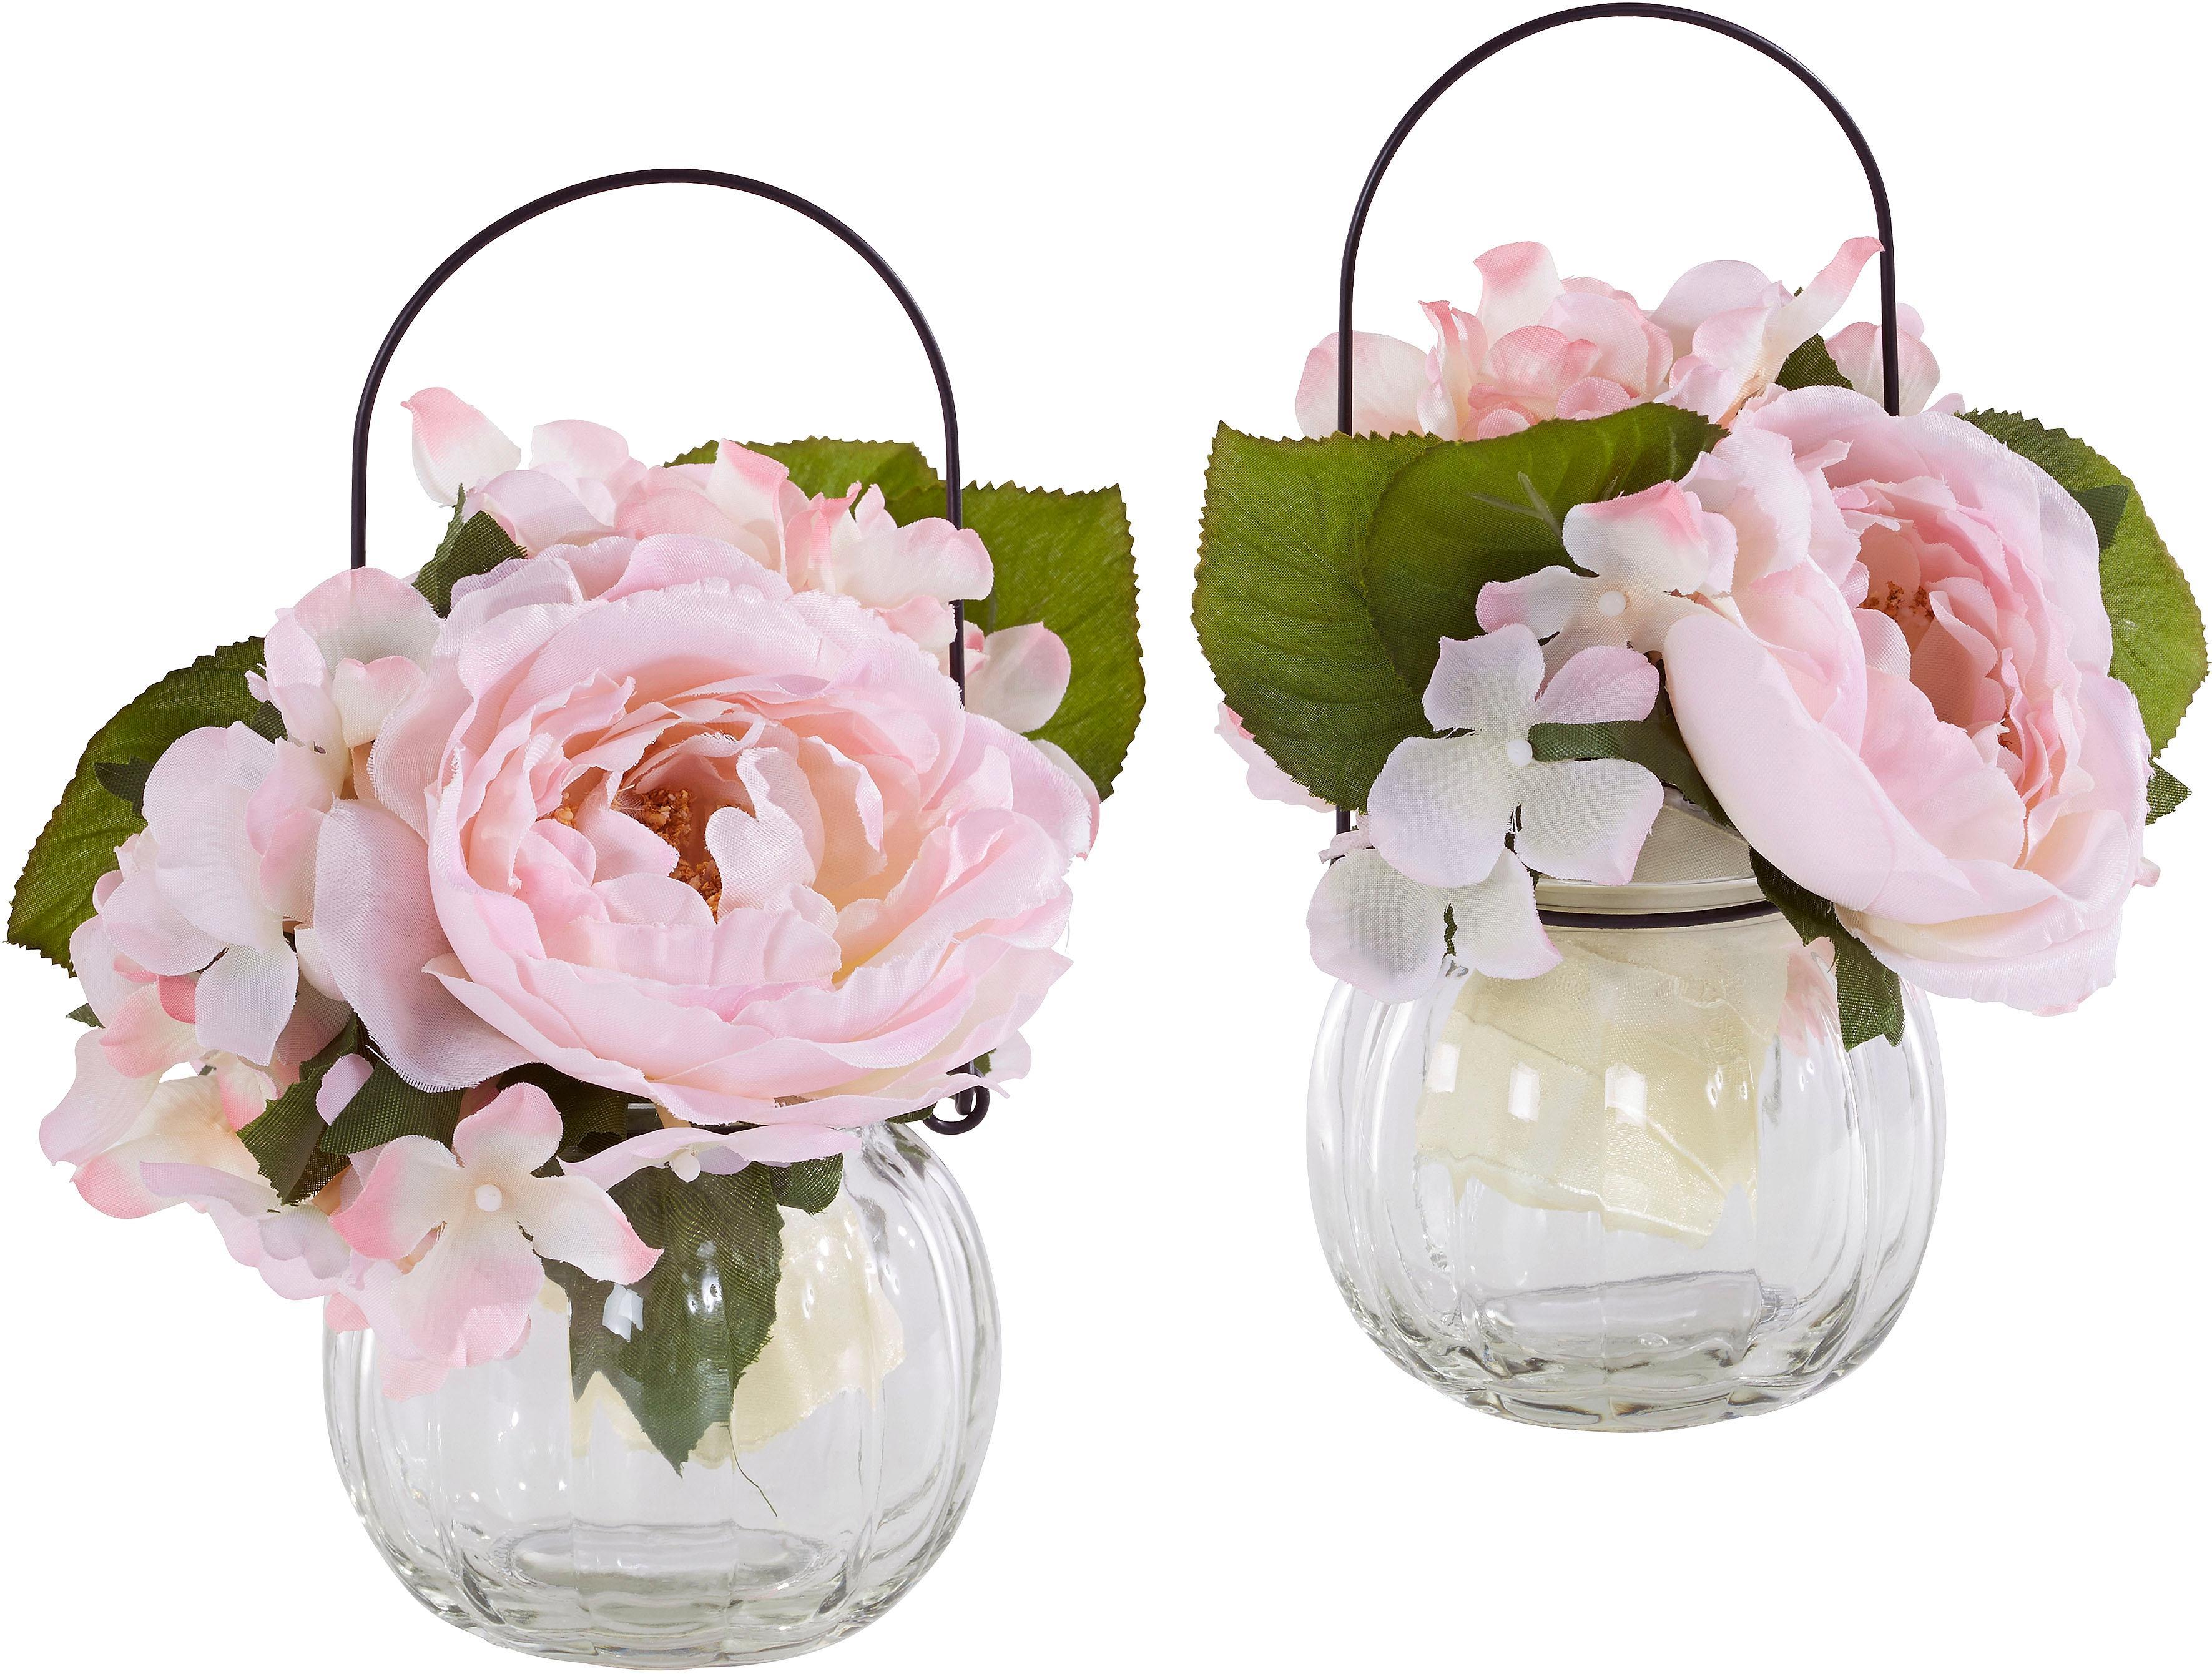 Home affaire Kunstblume Rosen im Glas (2er Set) Preisvergleich